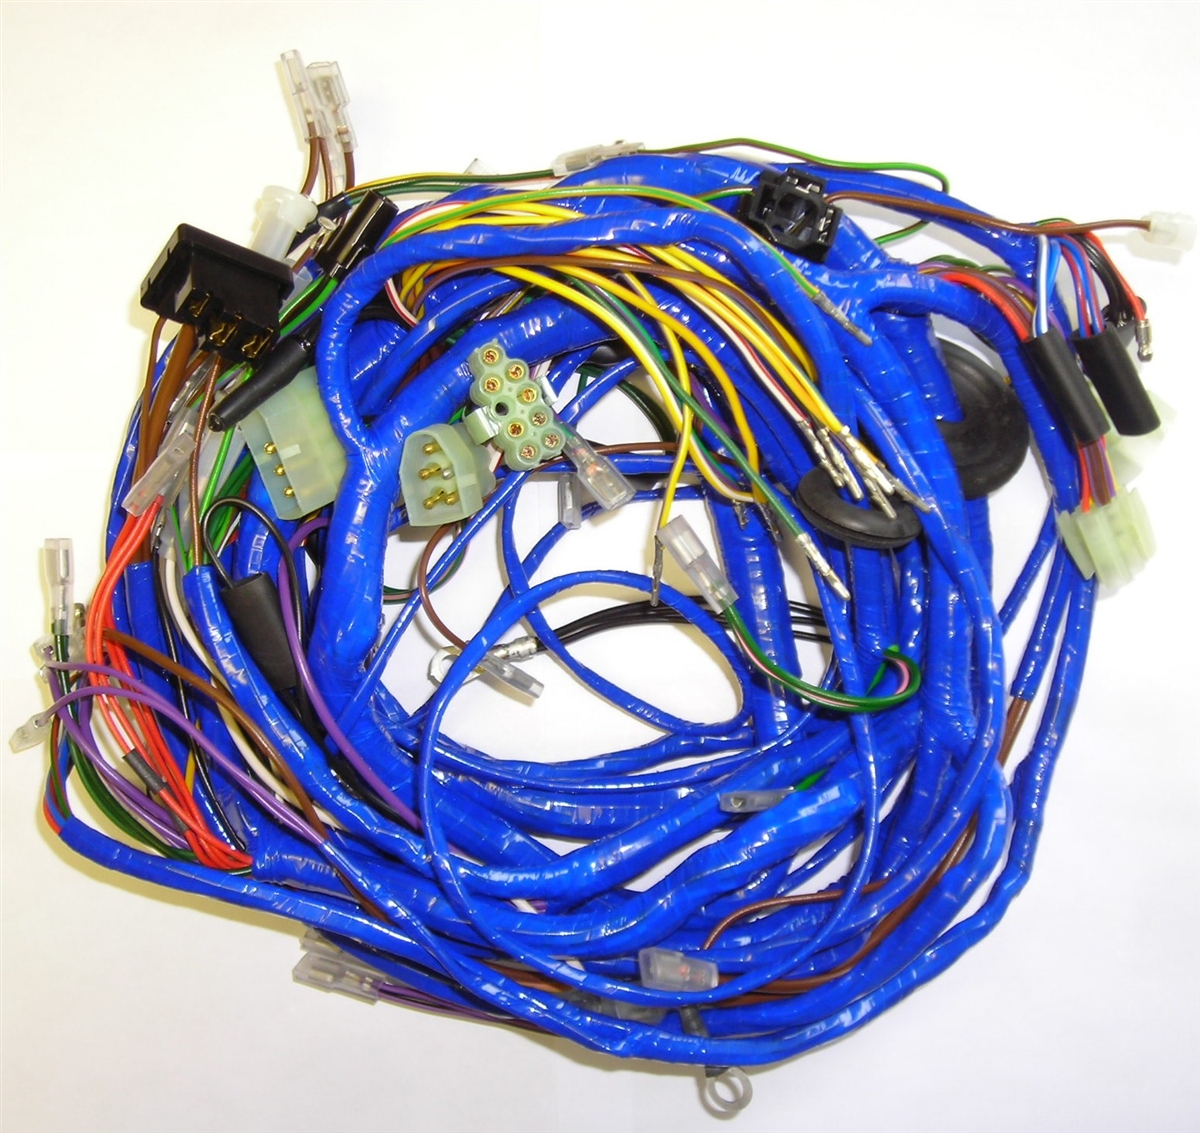 main wiring harness mg midget 1978 mg midget wiring harness mg midget wiring harness [ 1200 x 1133 Pixel ]